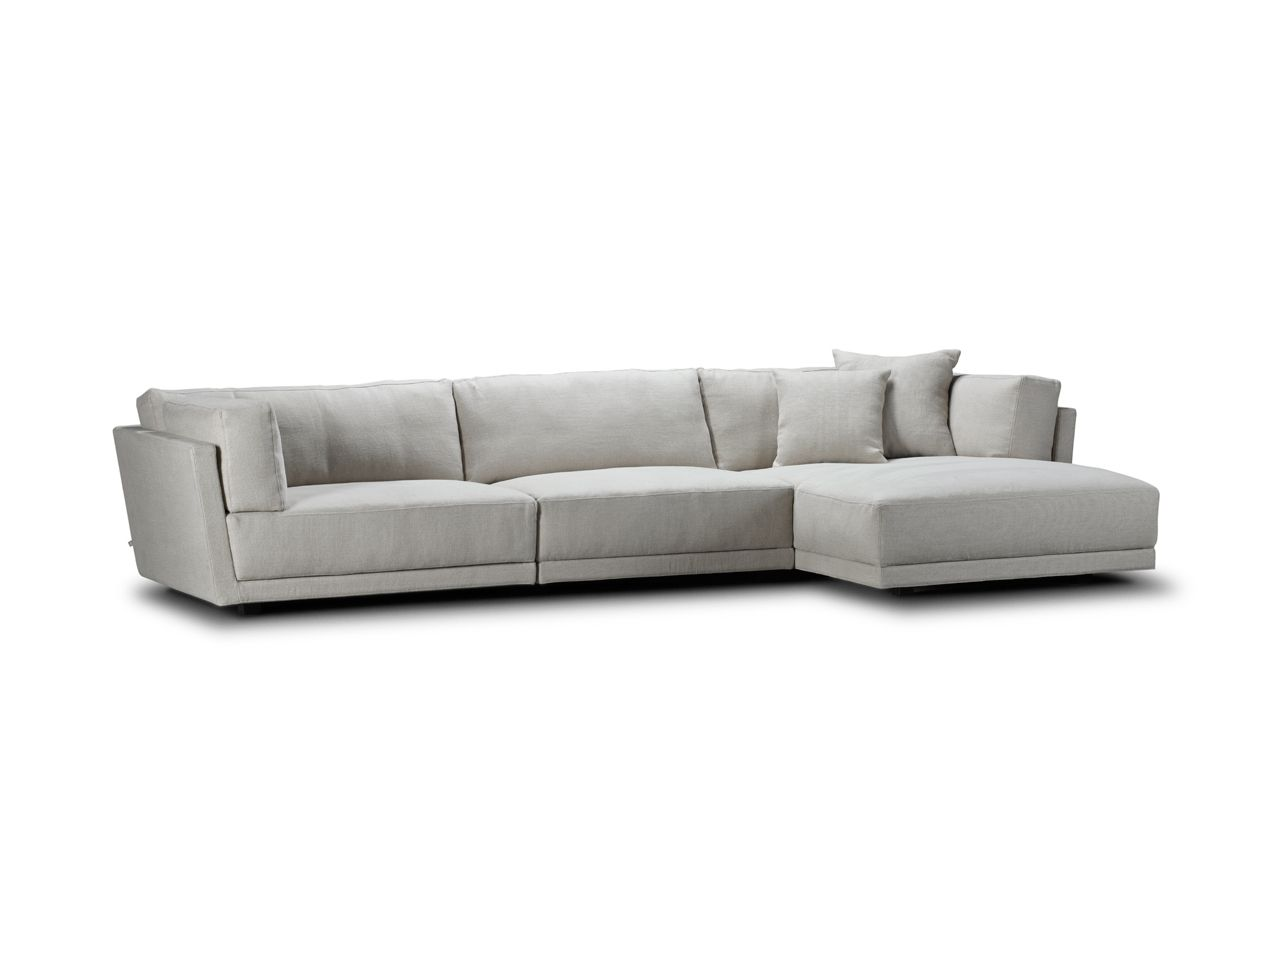 Eilersen Krypton Sofa Google Search